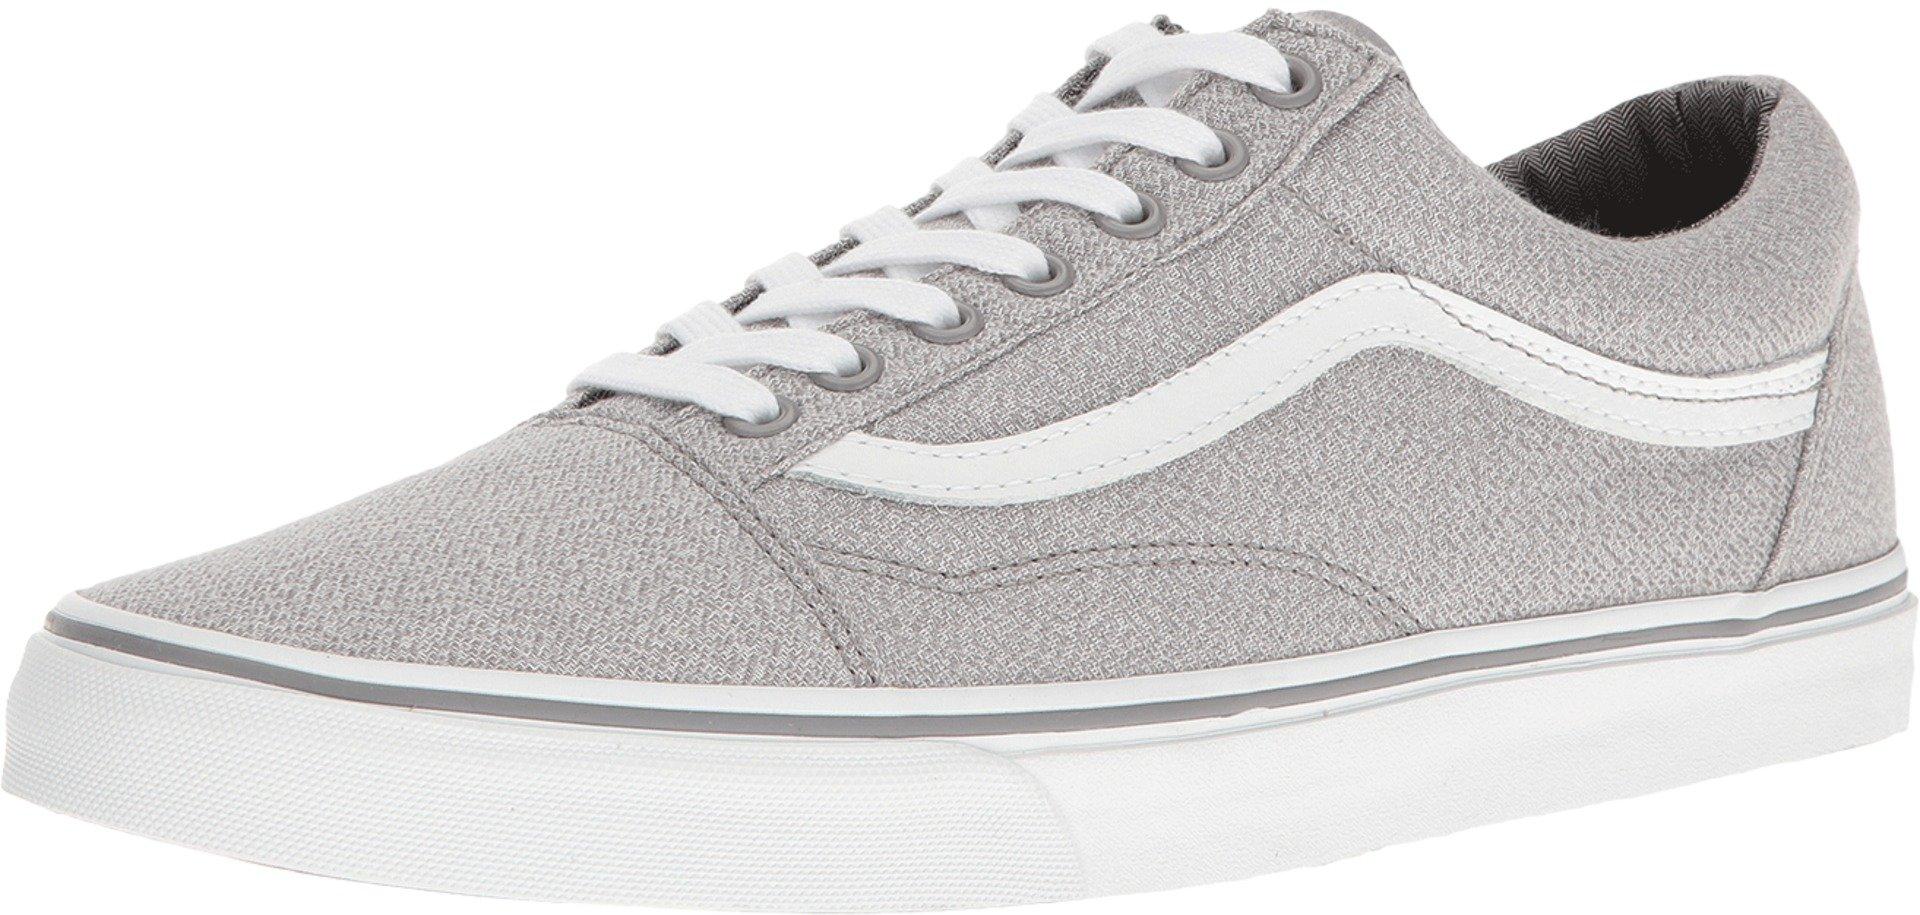 9 D B White Old Vans 0 Shoe7 Greytrue Skate mWomenssuitingFrost Mens Skool 5 mUs nk8P0wO